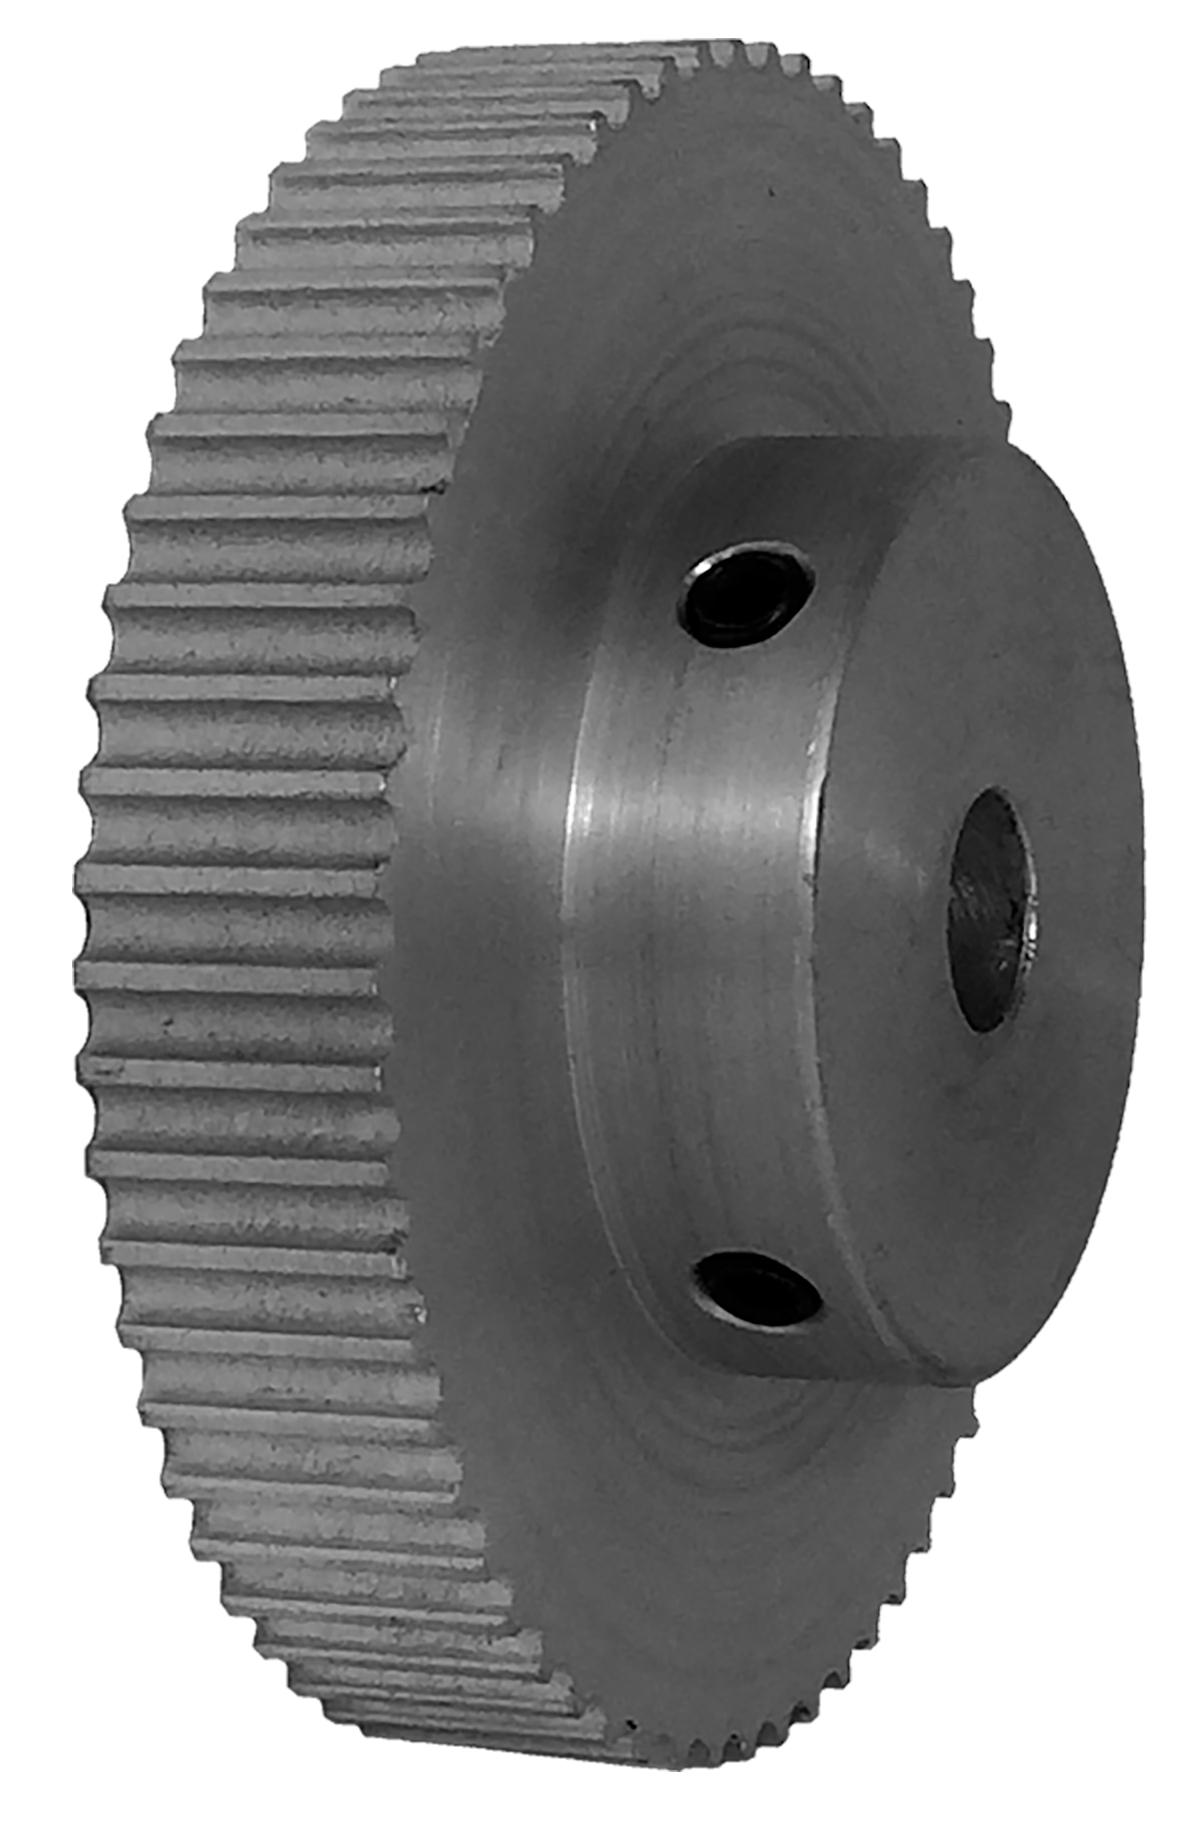 62-3P06-6A4 - Aluminum Powerhouse® Pulleys